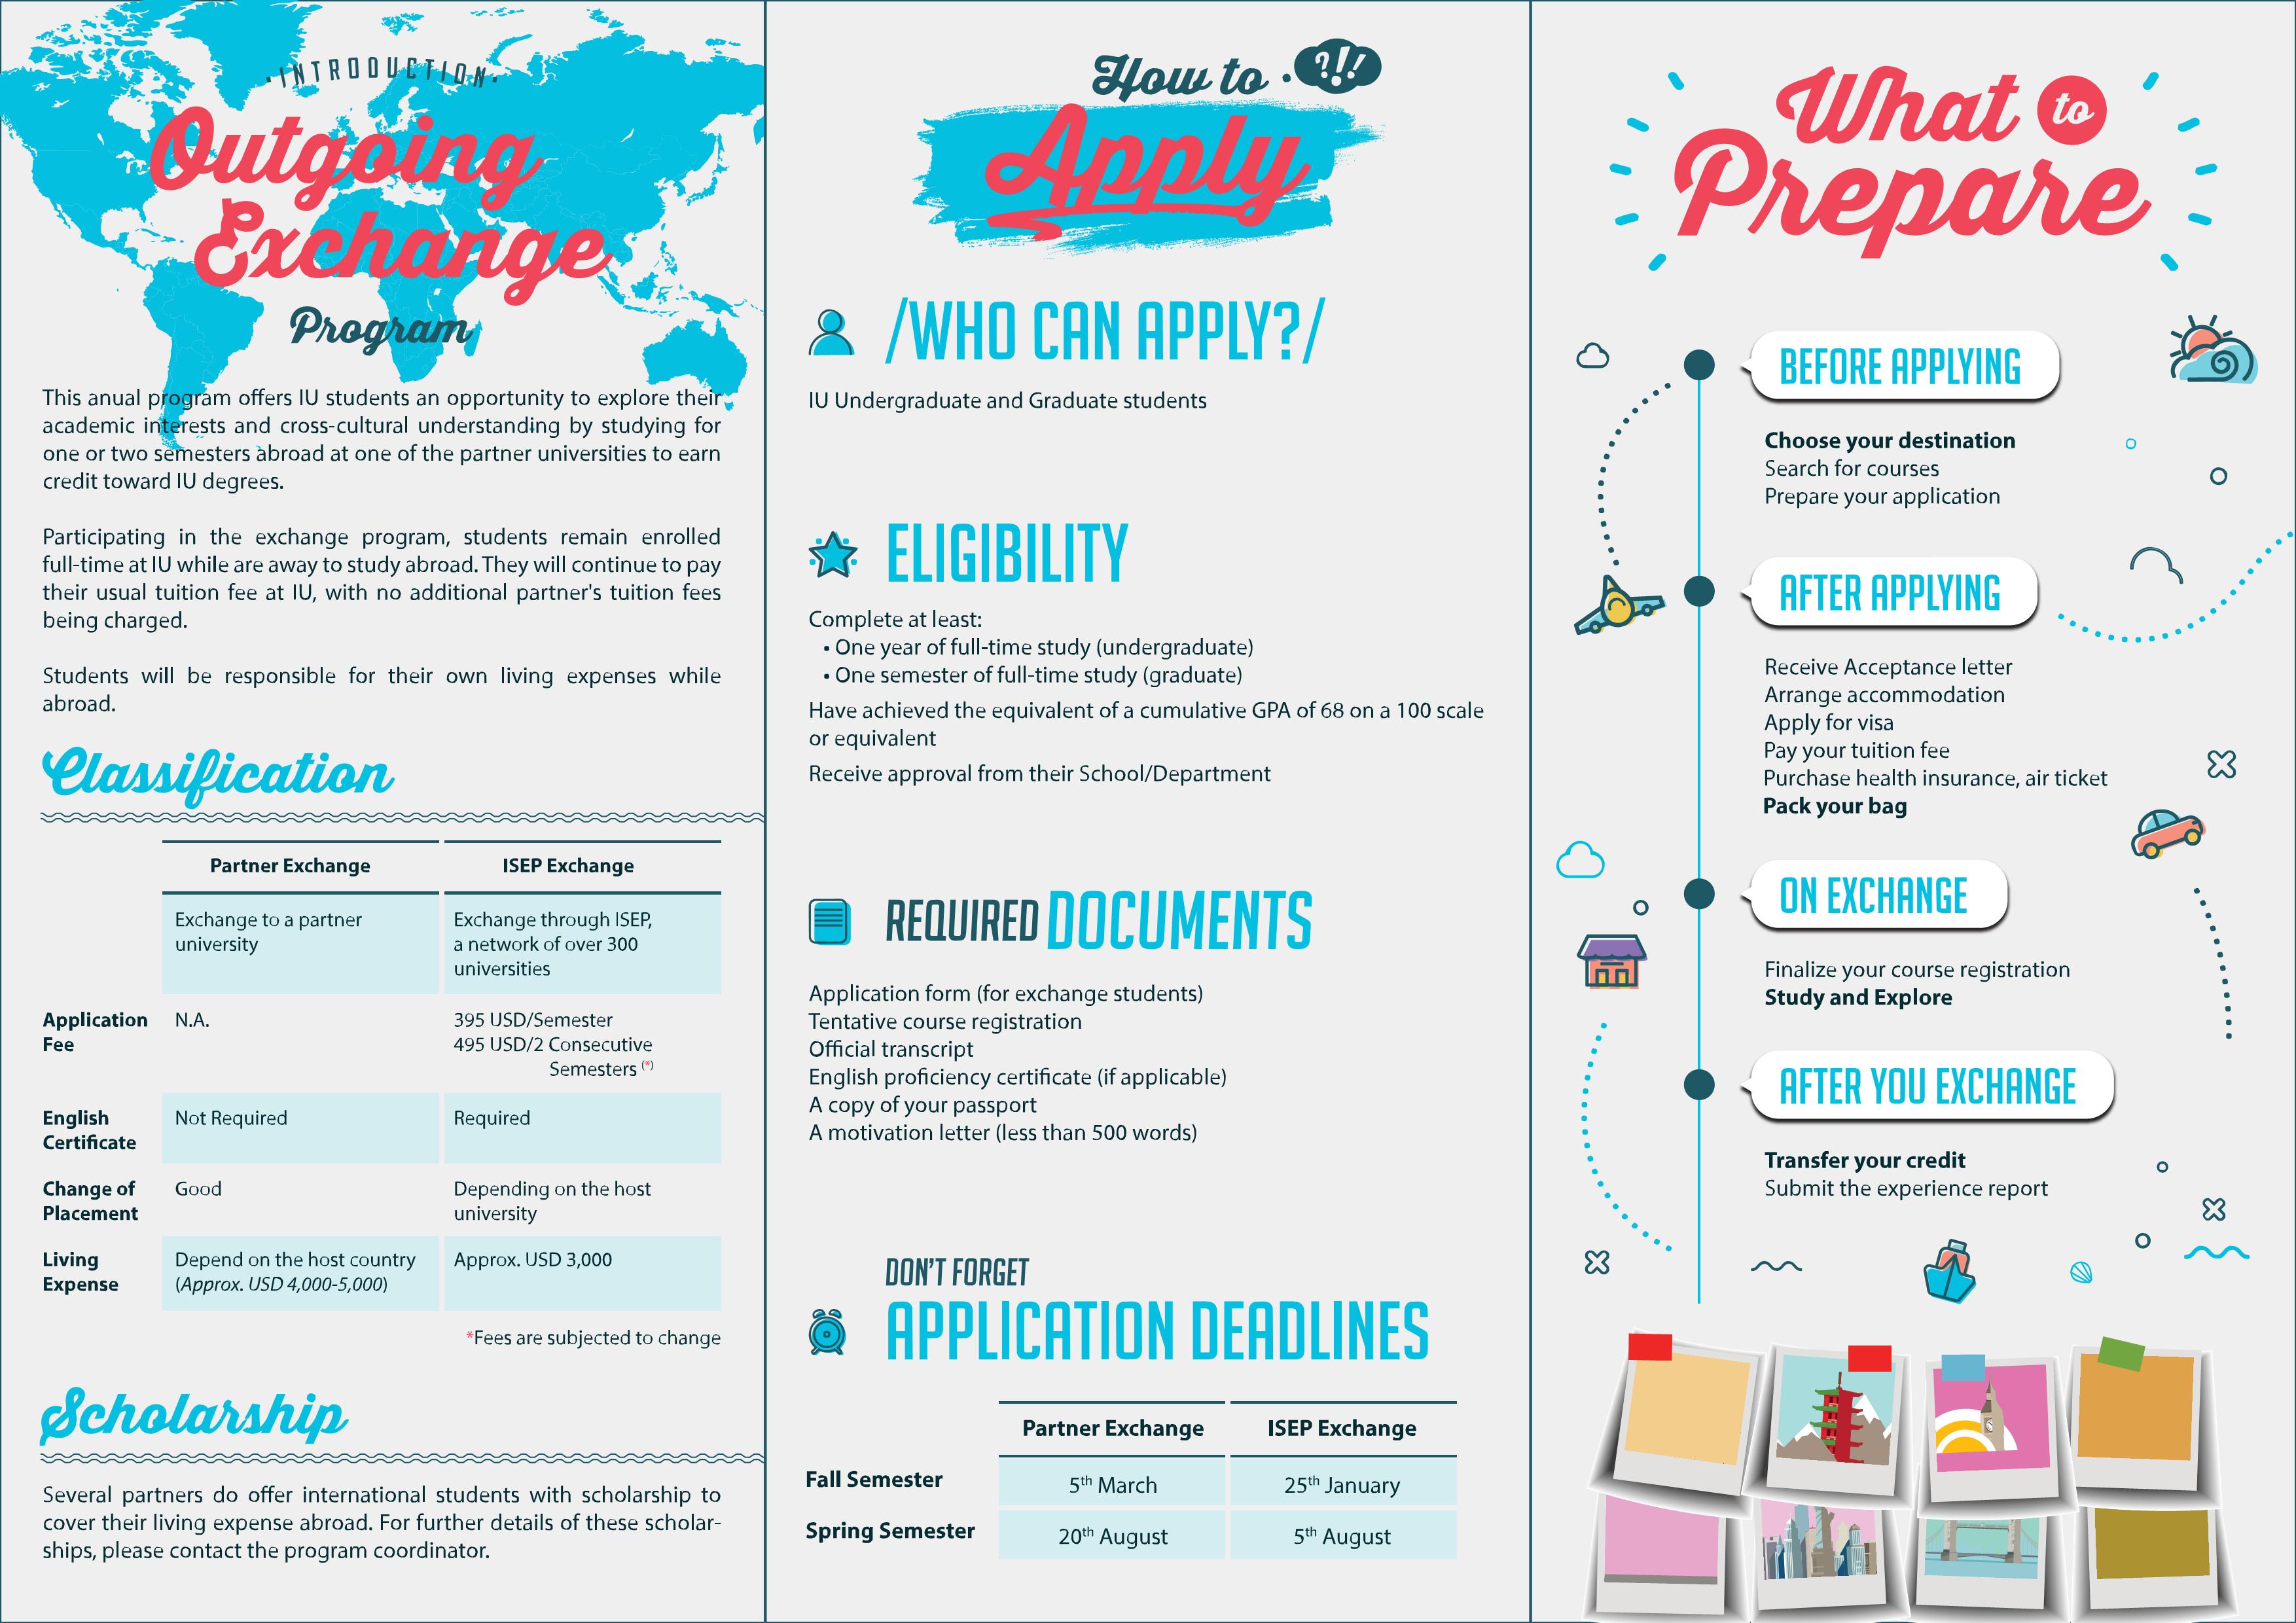 Tax accountant career path